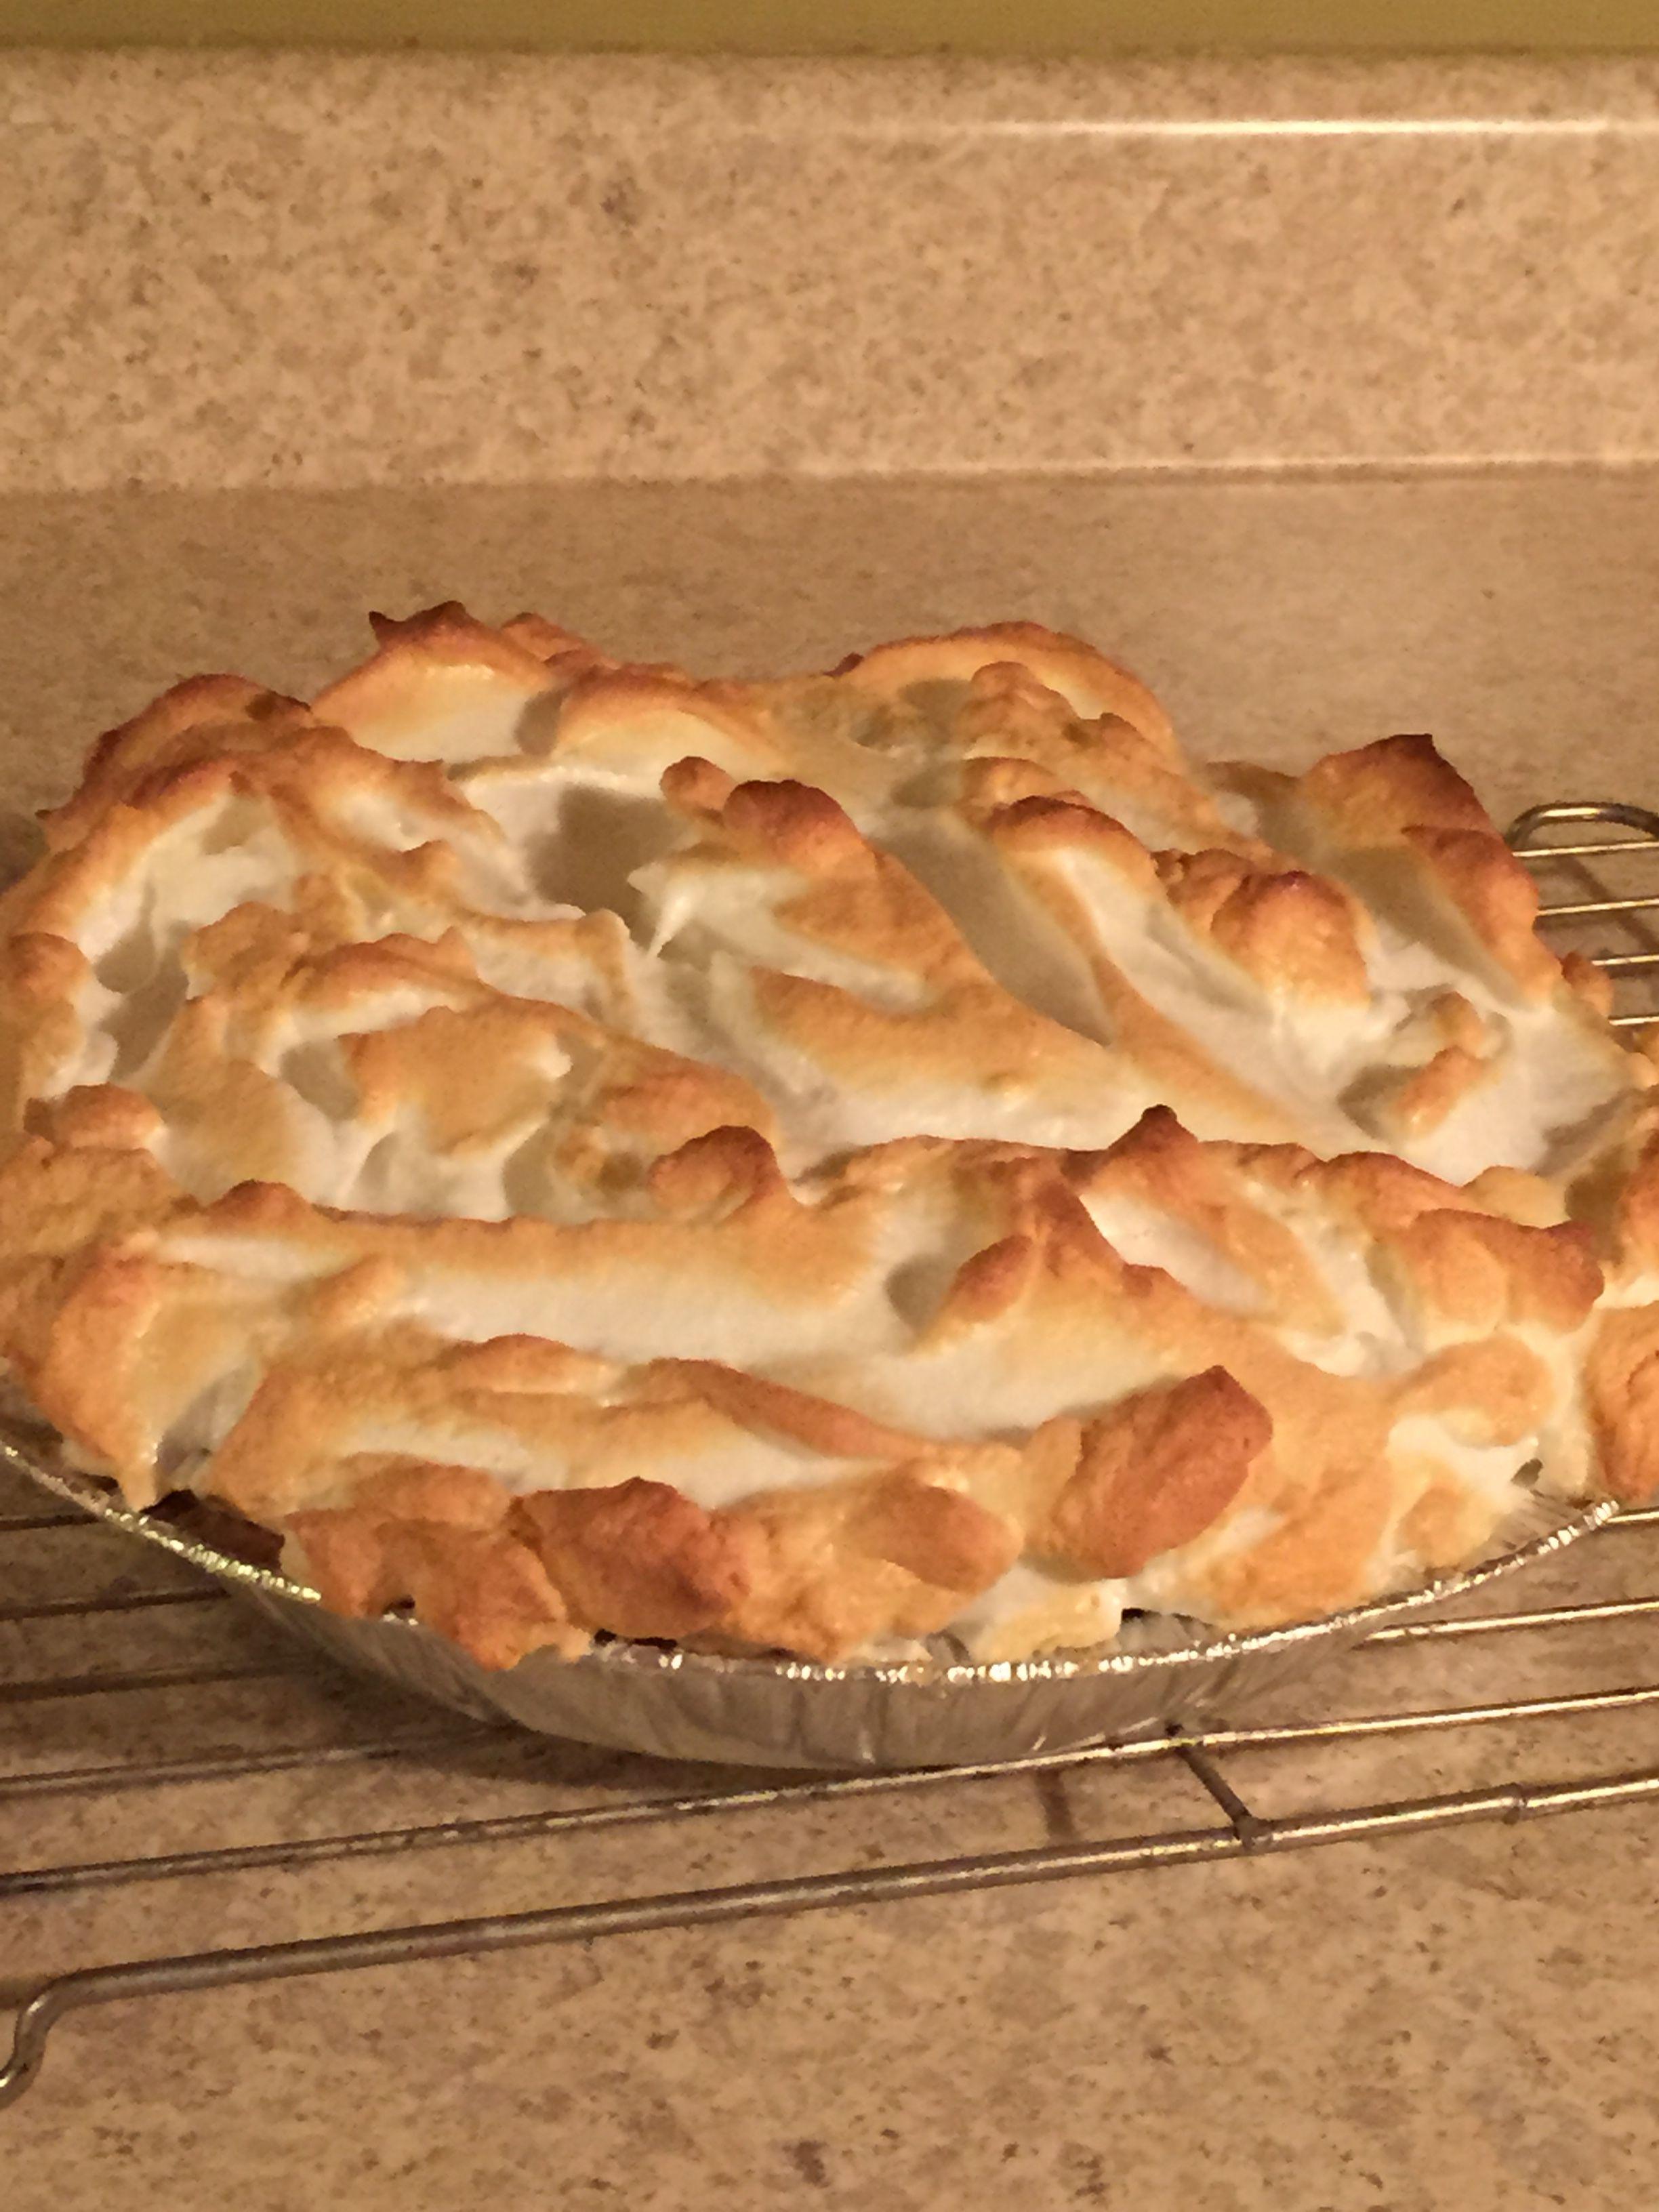 Lemon Meringue pie - homemade